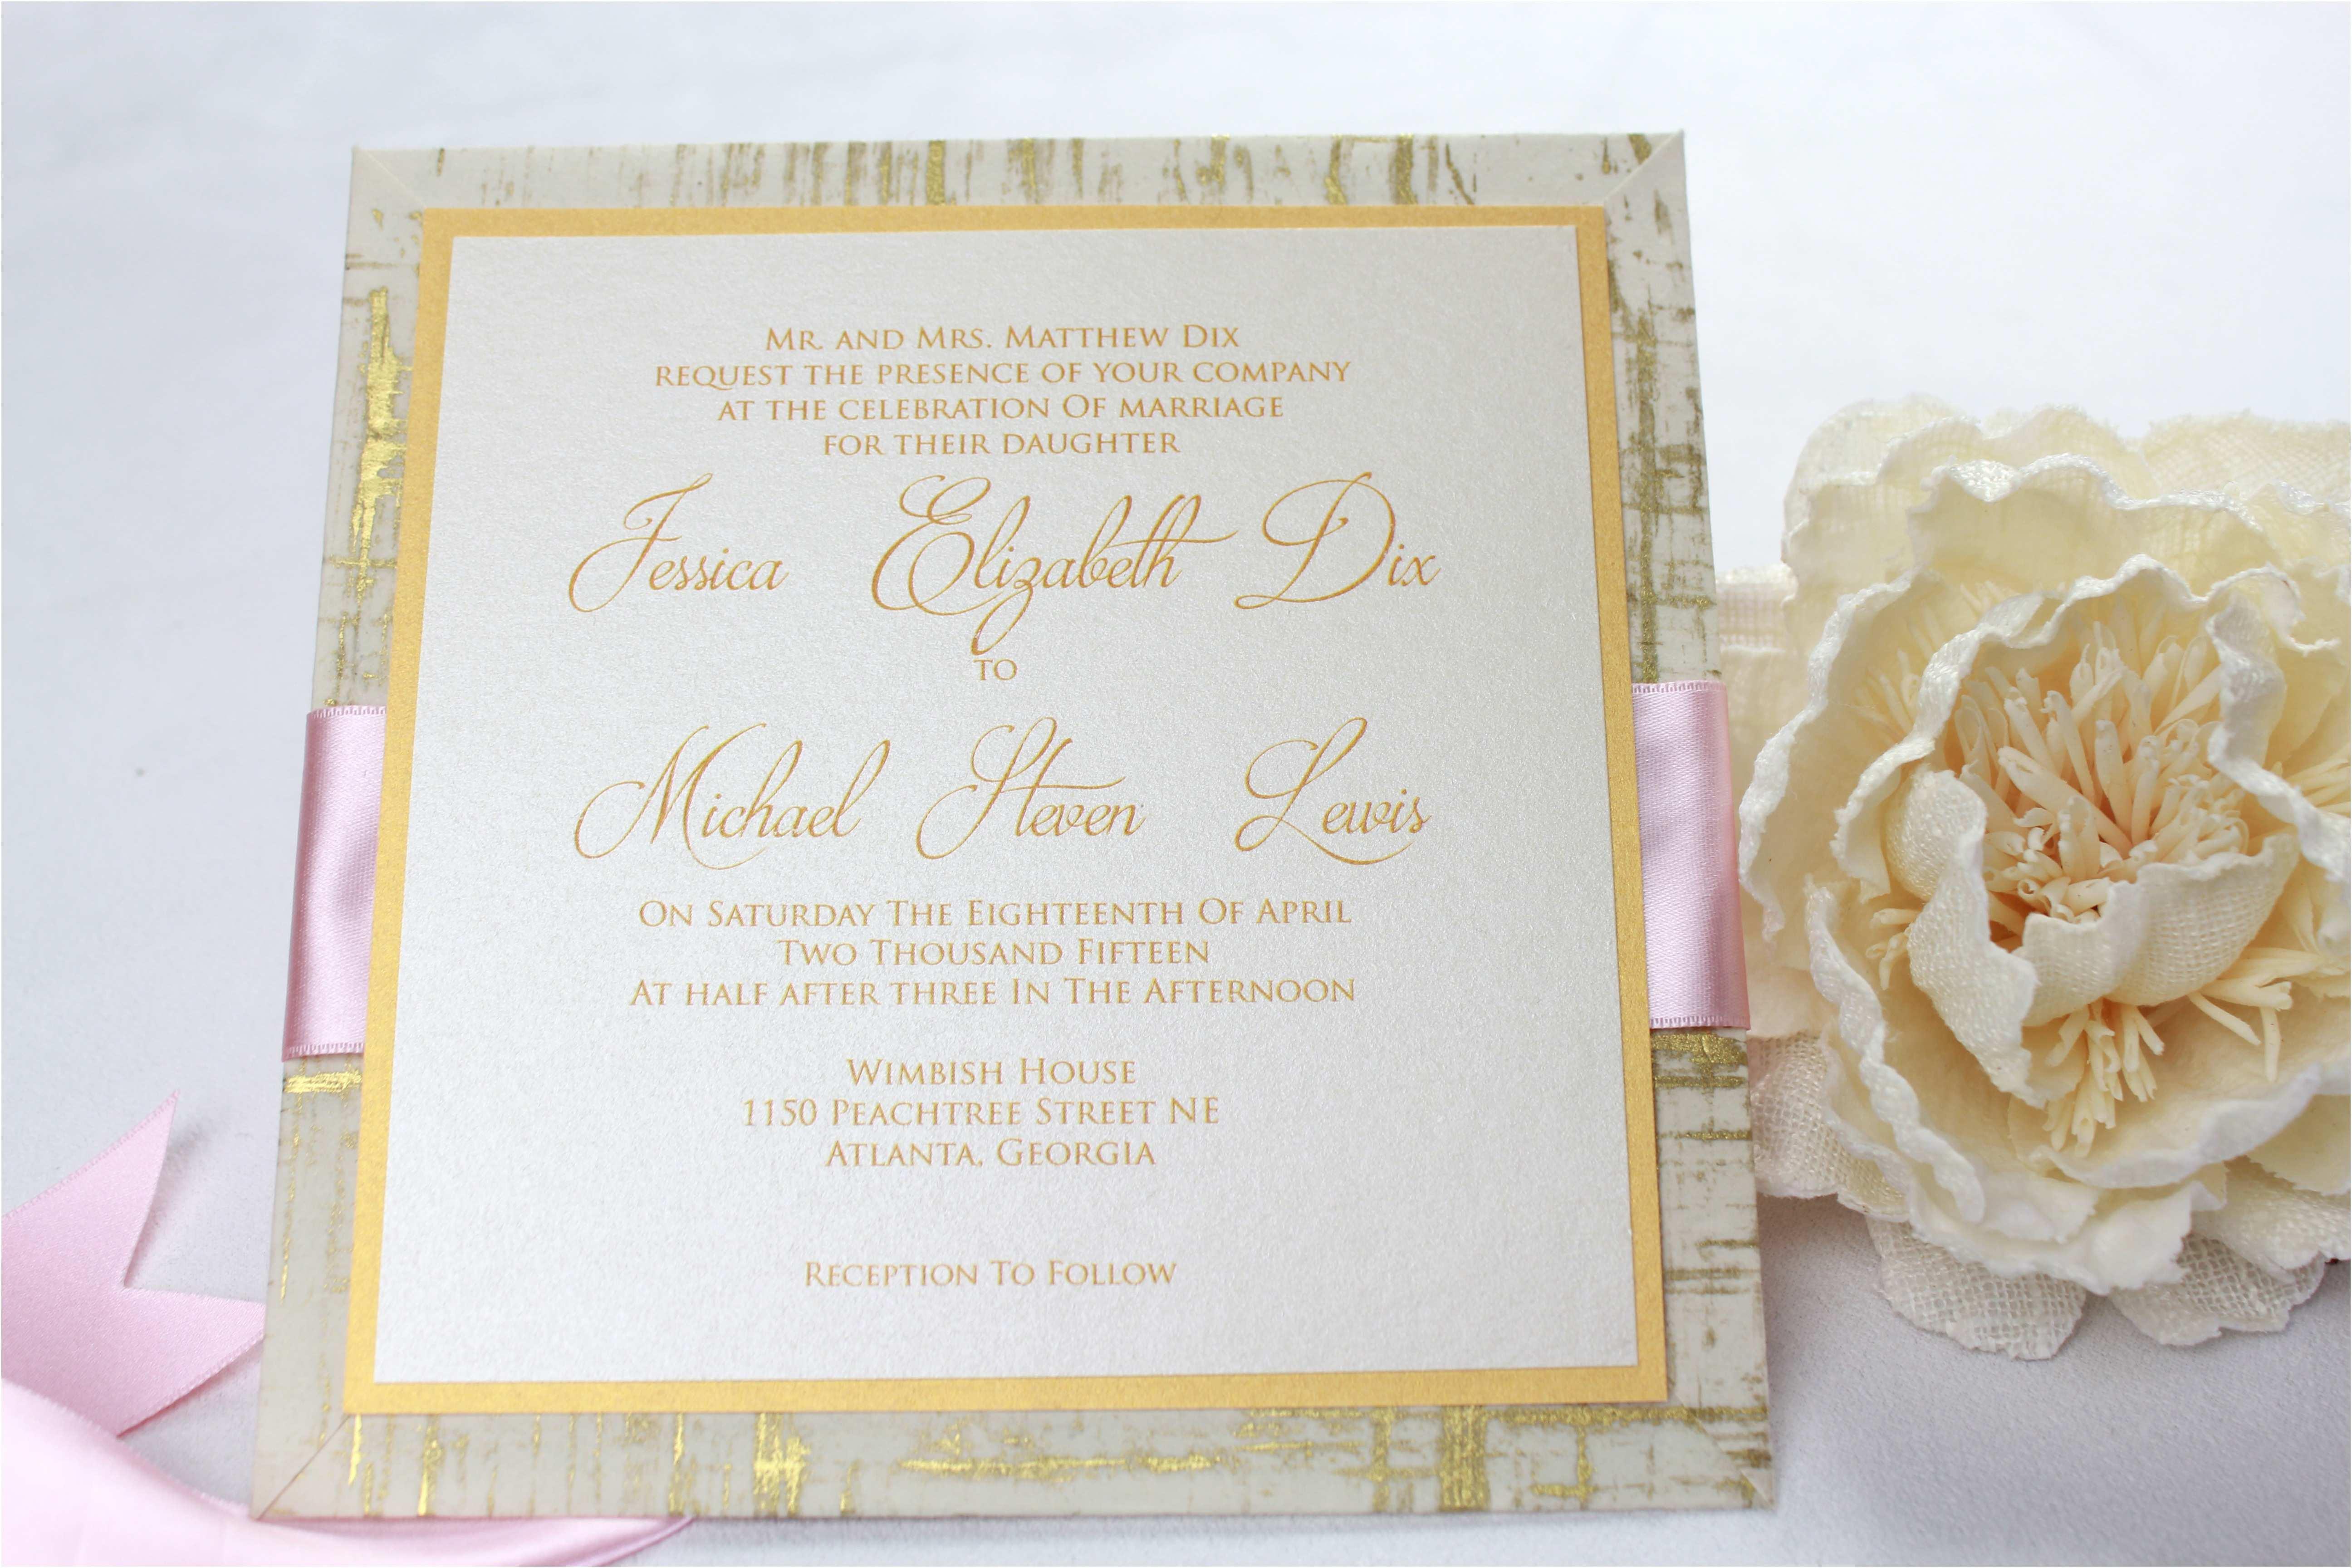 Wedding Invitations atlanta Old Fashioned Wedding Invitation Design Templates Ensign